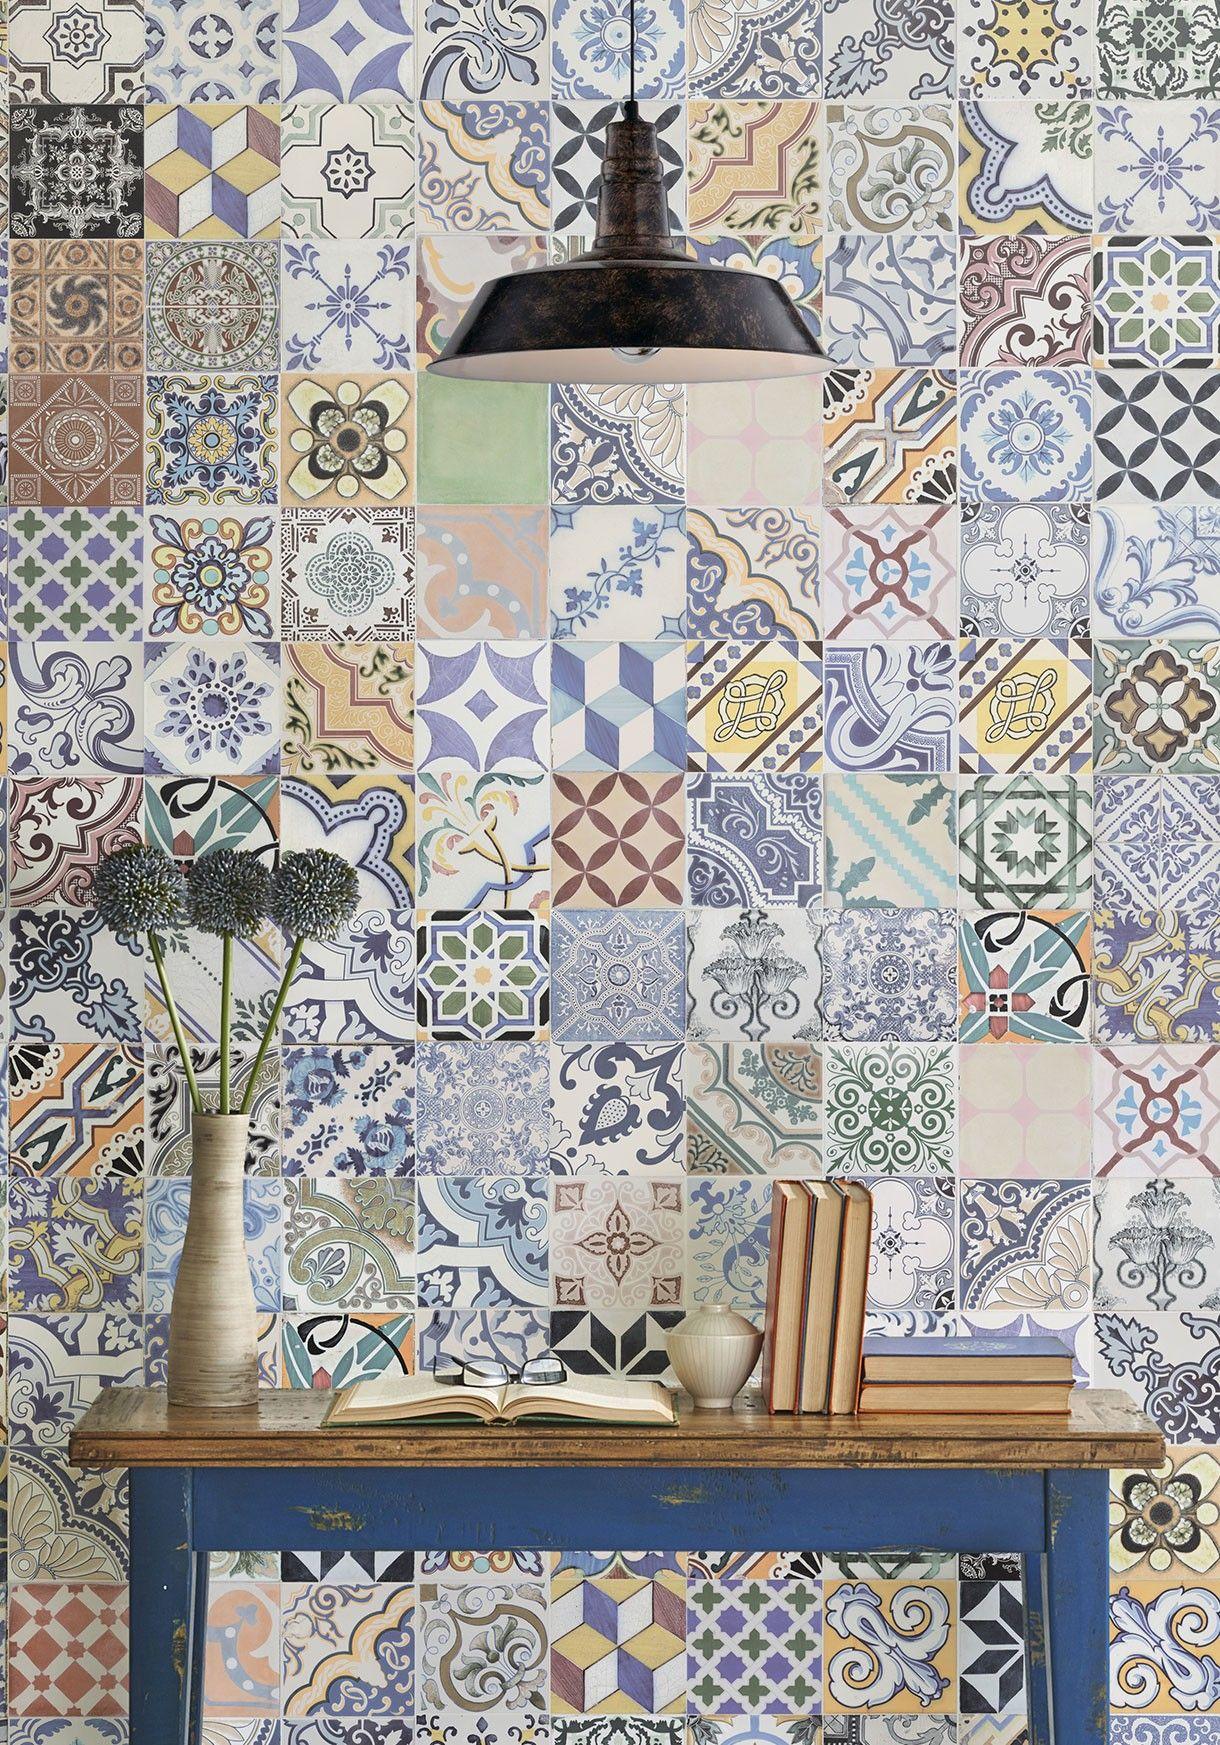 Cement Federation Tile Wallpaper By Milton King Tile Wallpaper Reclaimed Tile Traditional Wallpaper Alexis spanish tile wallpaper